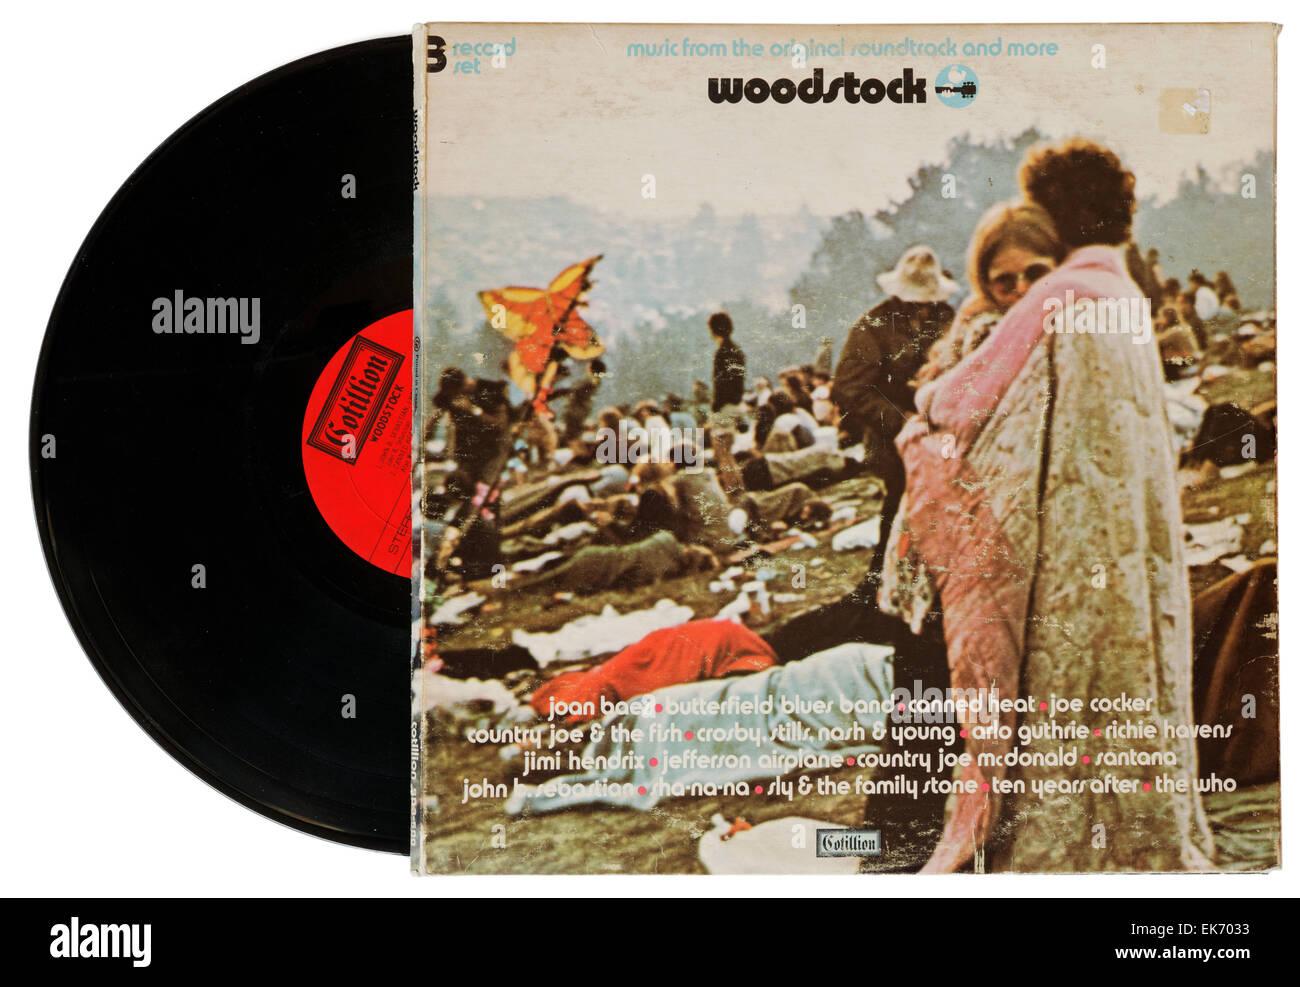 Woodstock Festival soundtrack album - Stock Image